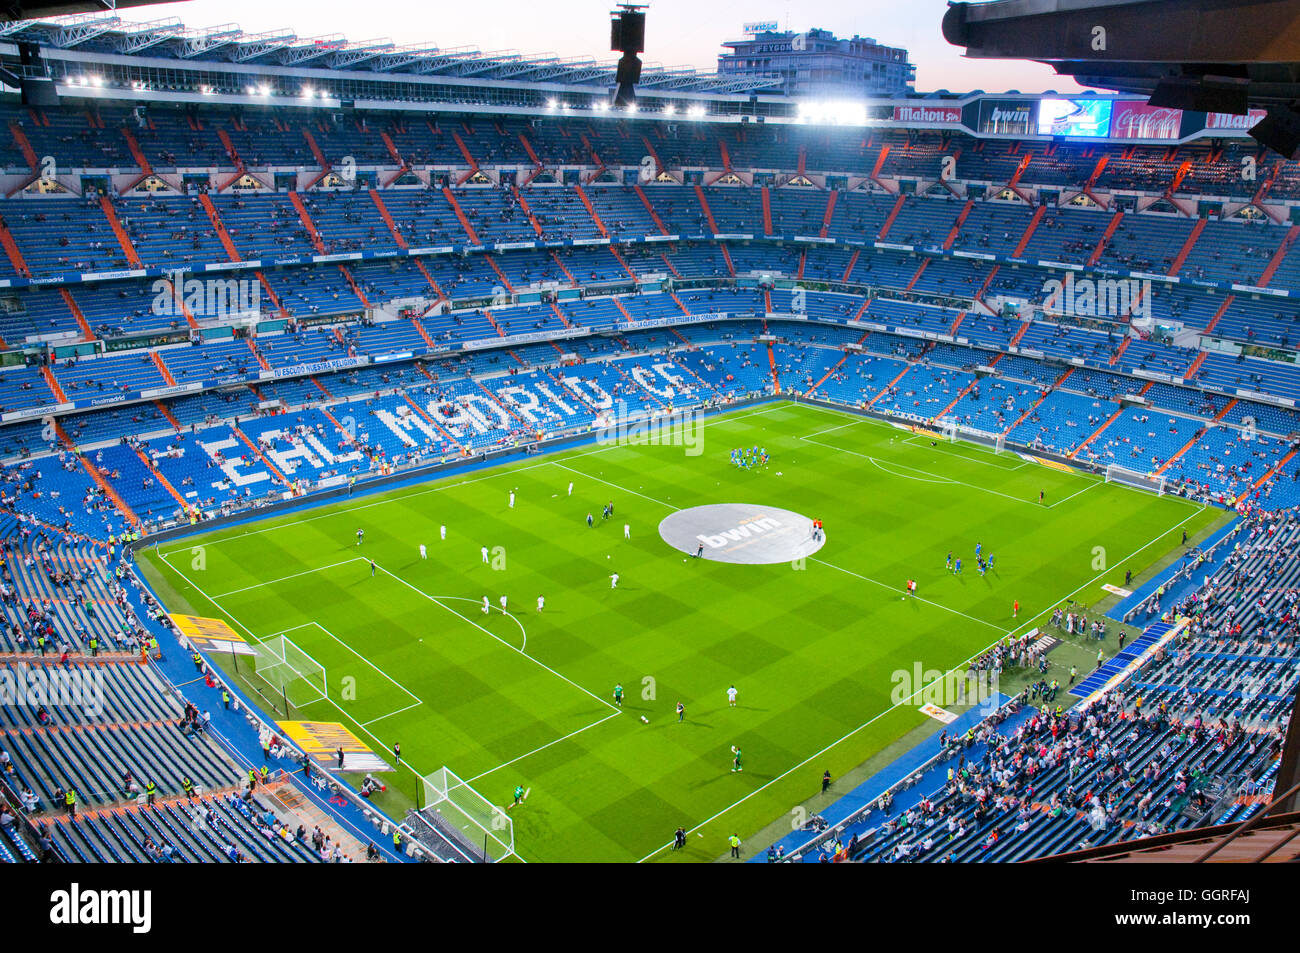 Players warming up before the match. Santiago Bernabeu stadium, Madrid, Spain. - Stock Image